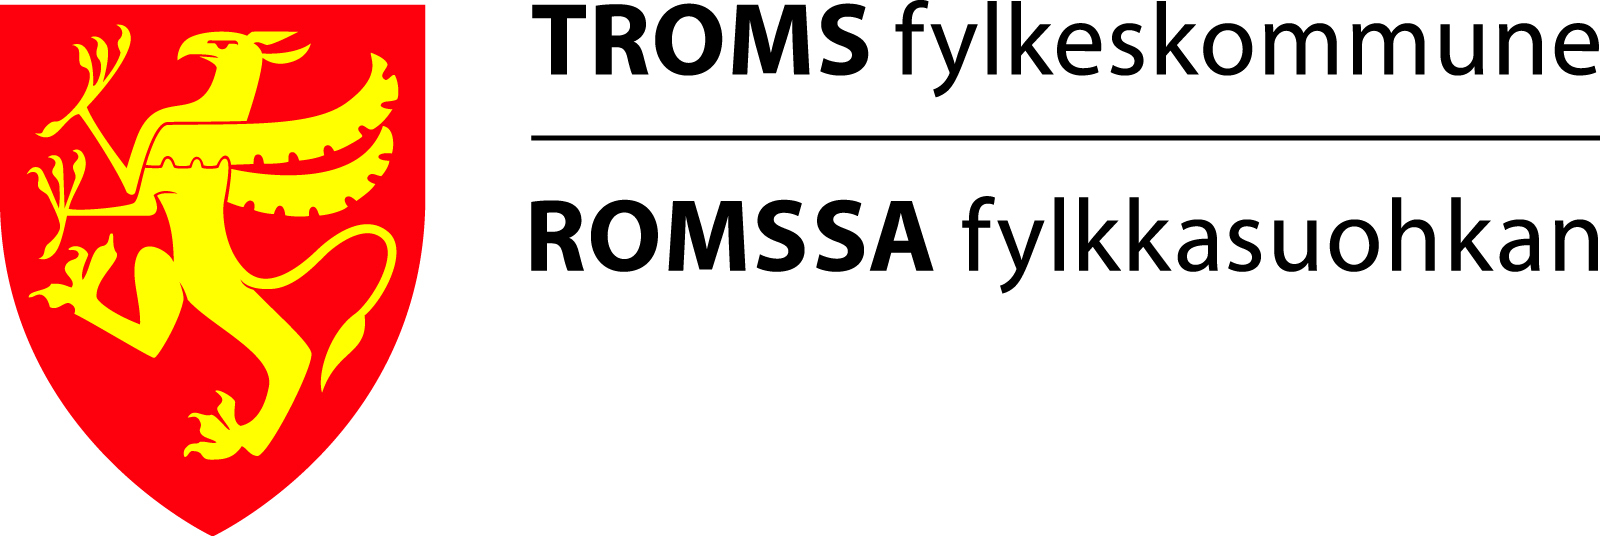 Troms fylke